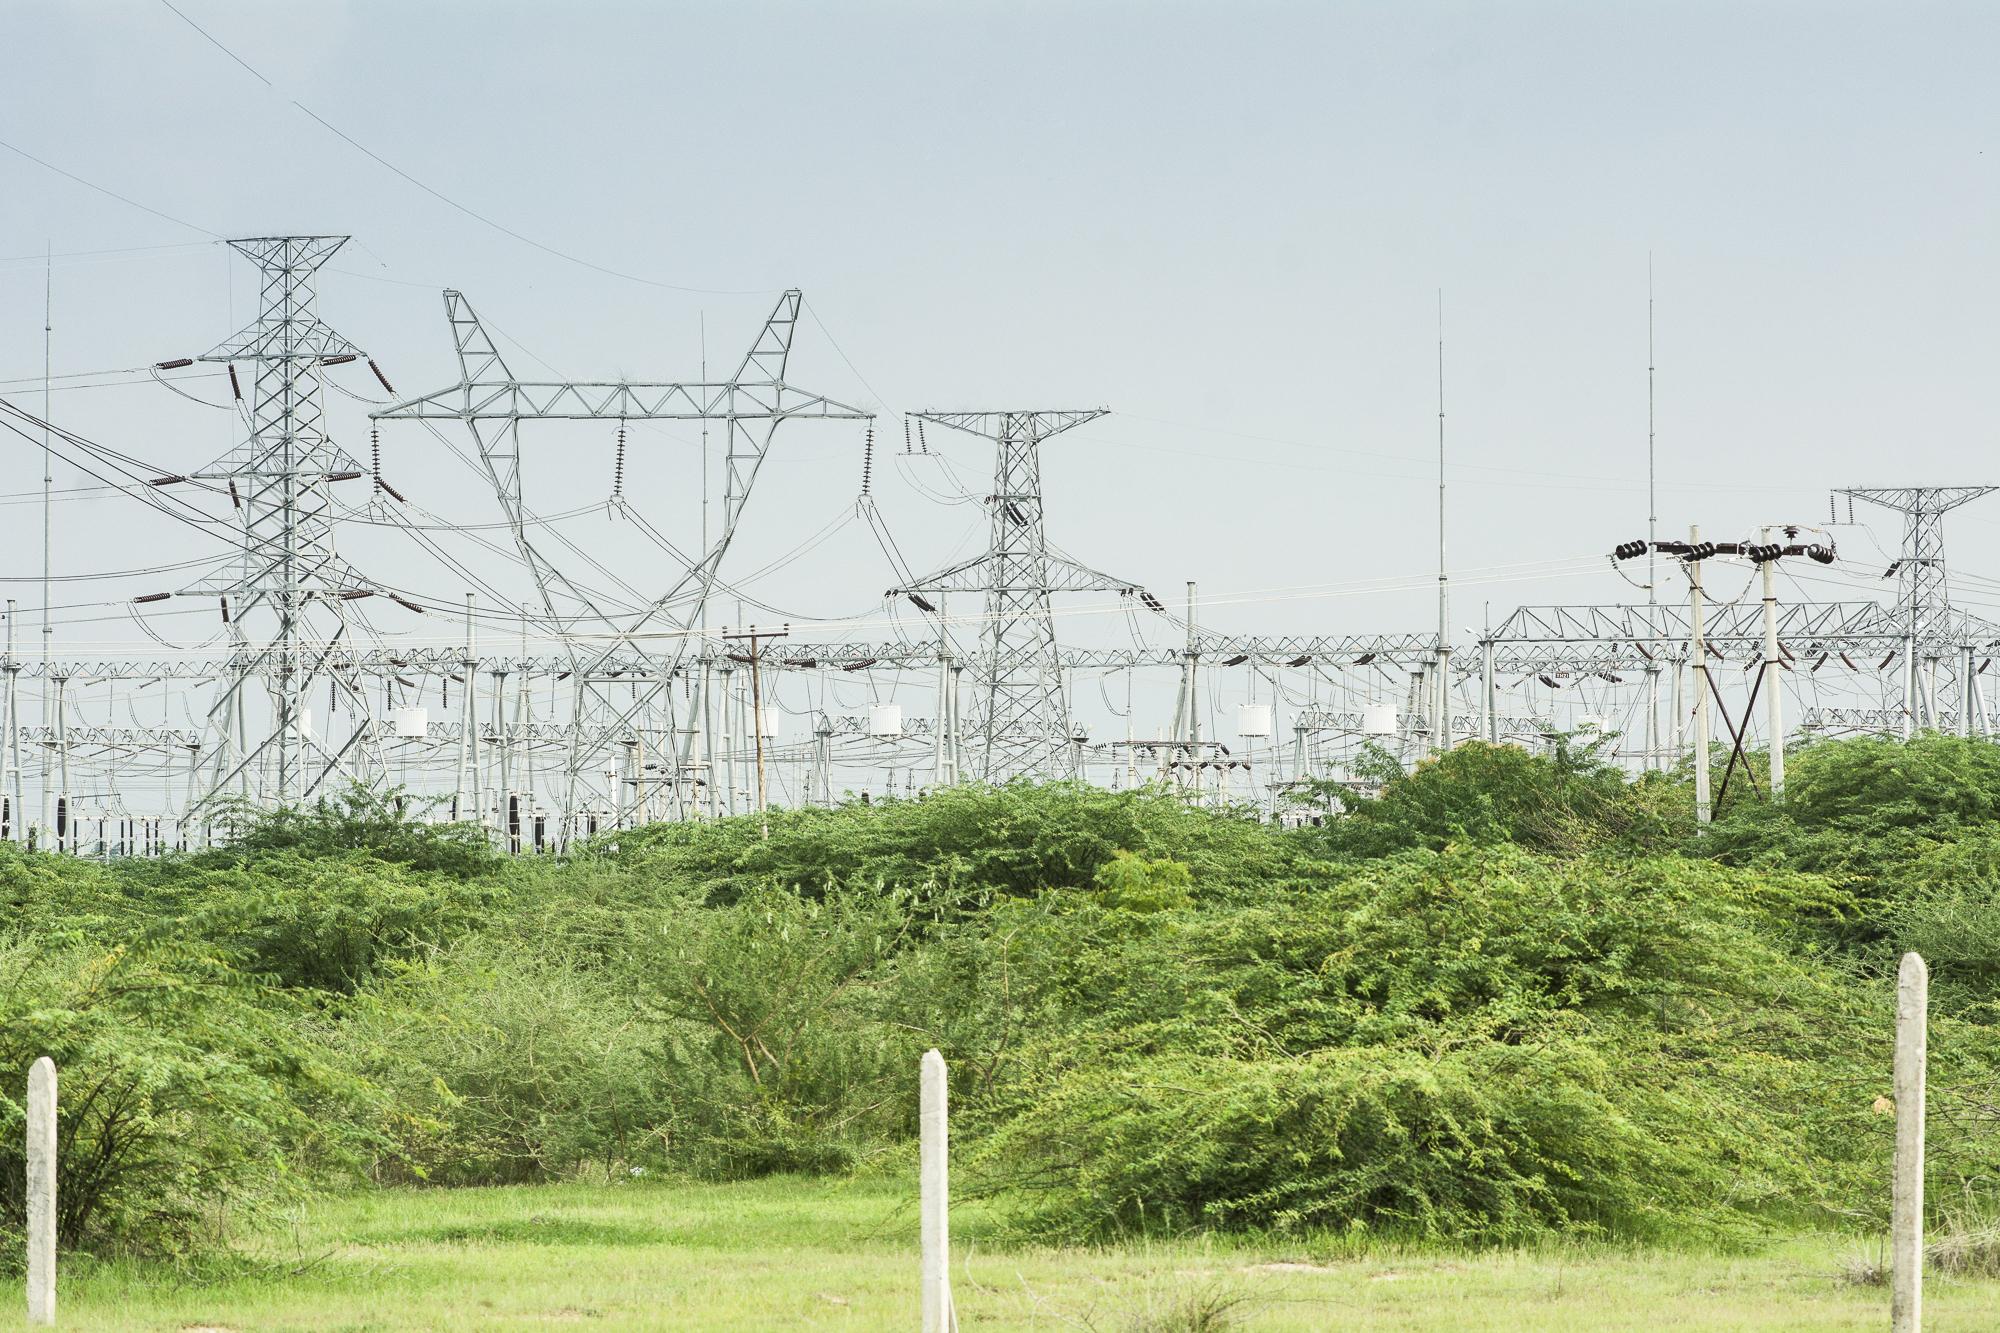 Myanmar electrical substation Thazi township